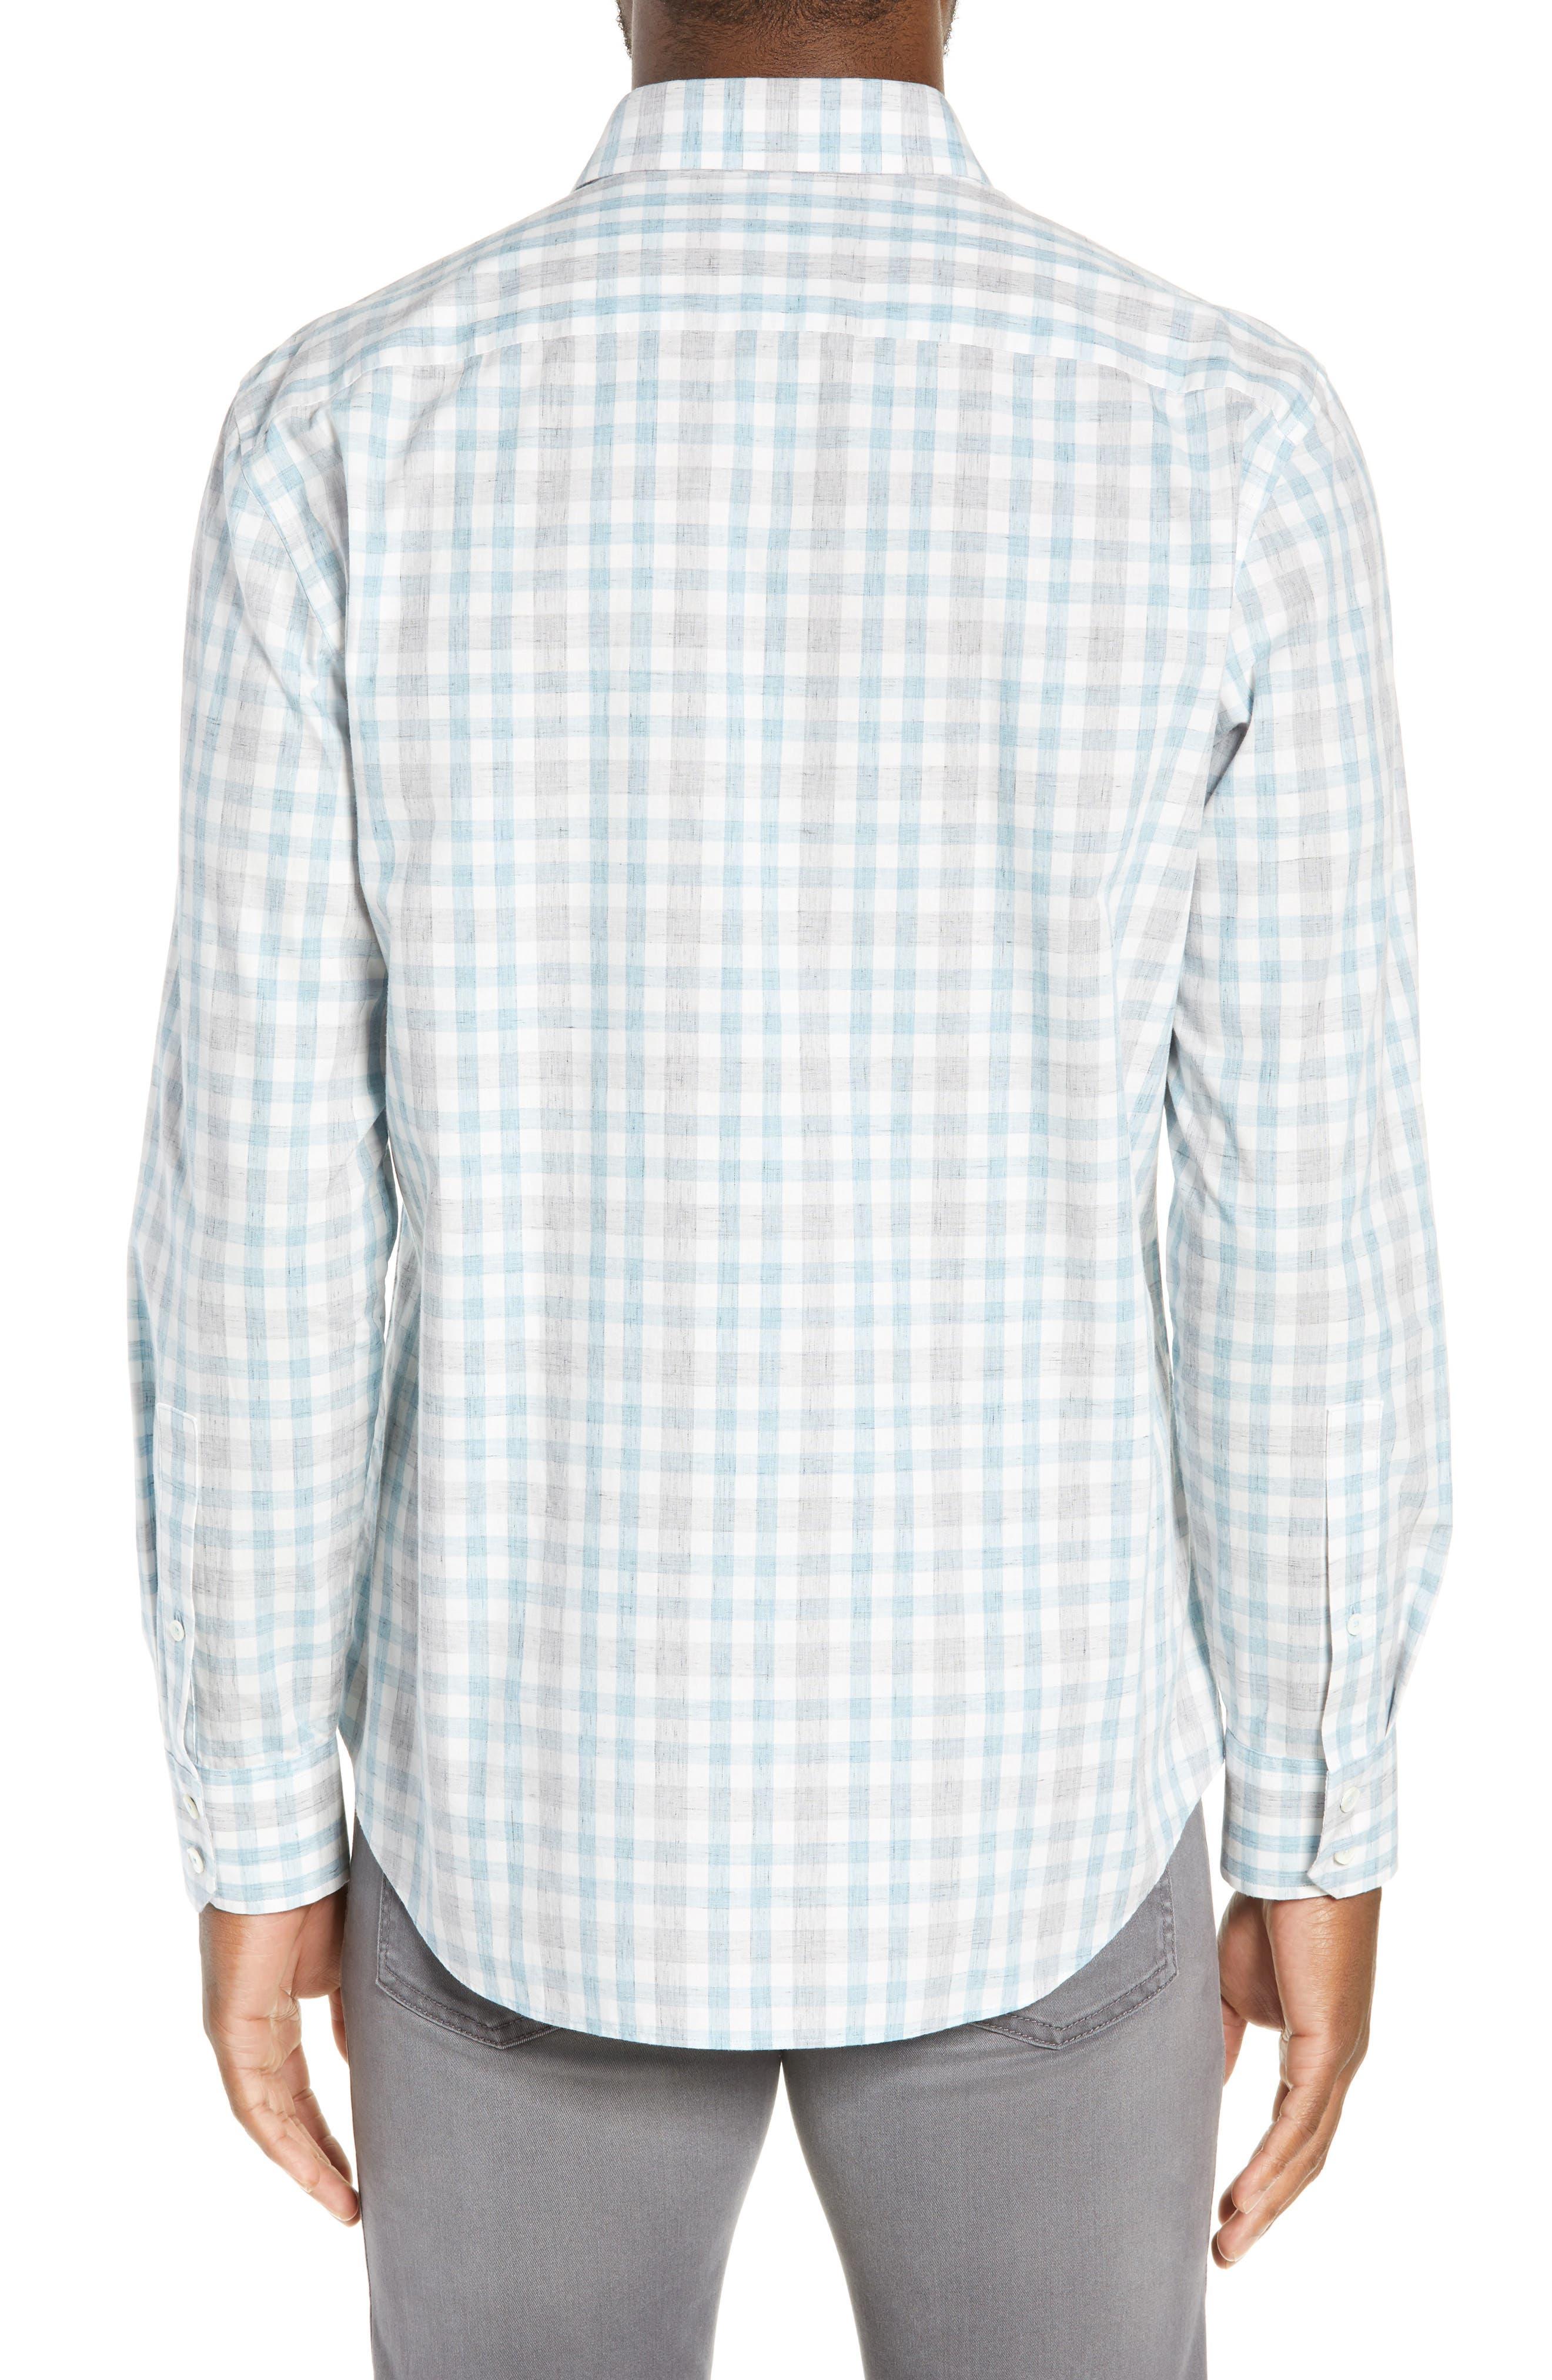 ZACHARY PRELL, Regular Fit Plaid Sport Shirt, Alternate thumbnail 3, color, LIGHT BLUE